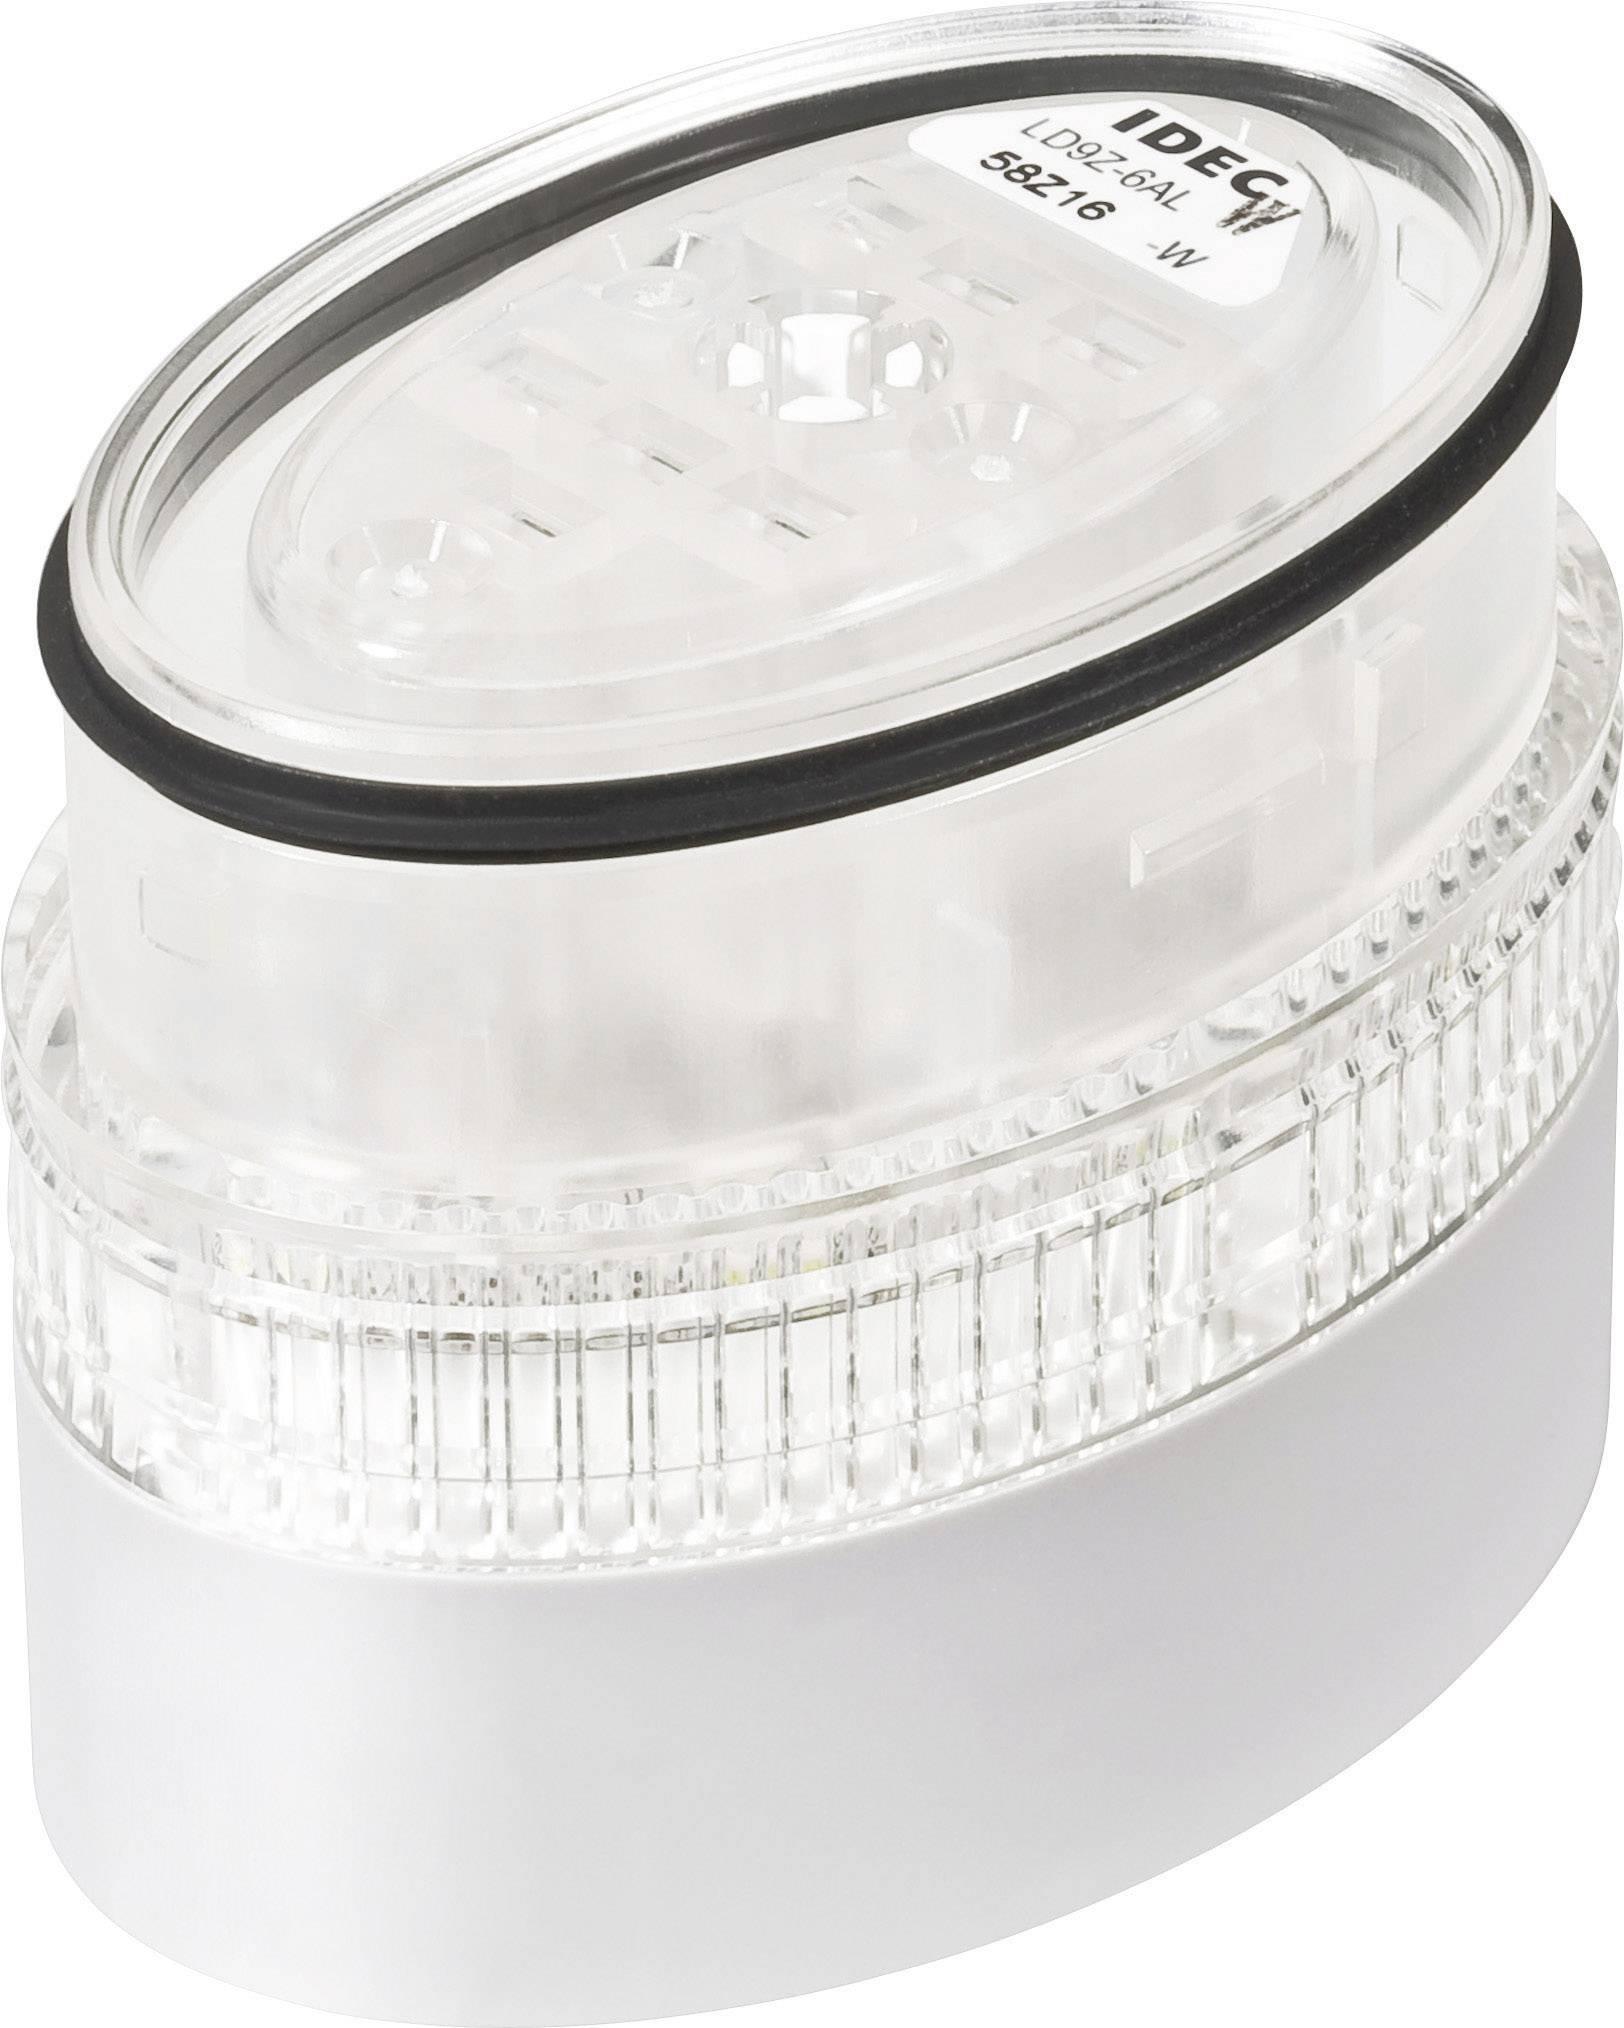 LED signalizace Idec LD6A (LD9Z-6ALW-W), IP65, Ø 40 x 60 mm, bílá